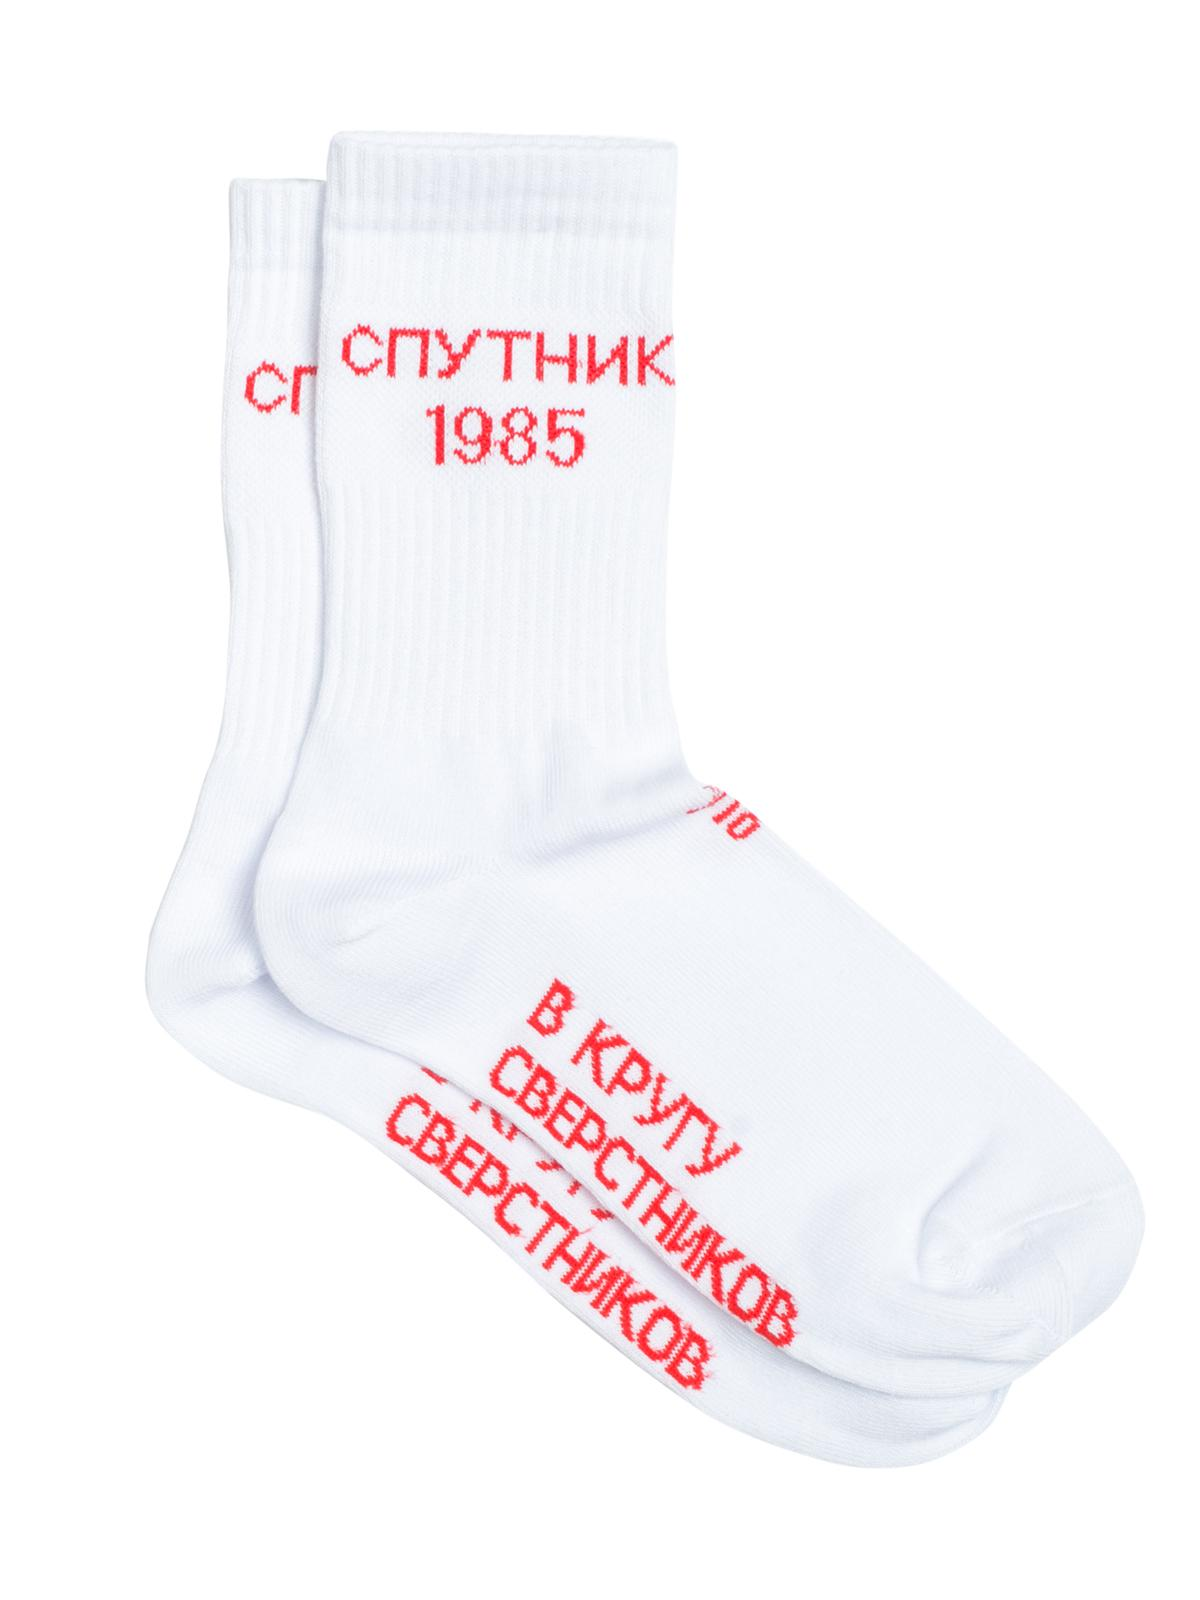 Носки Спутник 1985 - H30 - 41-43рр